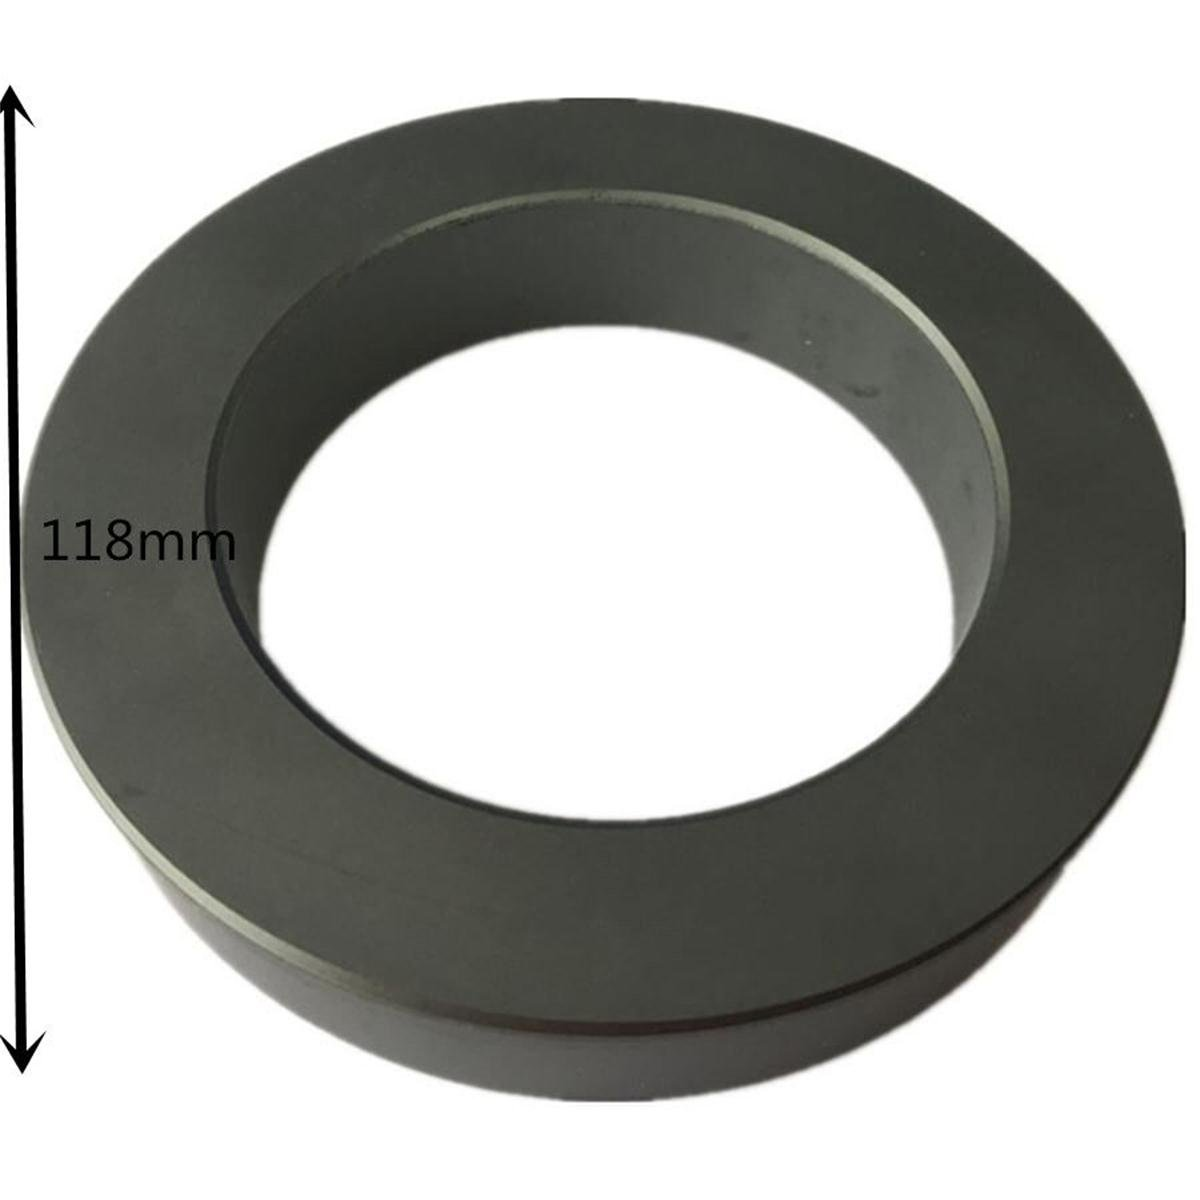 Hondark 1unit 118X80X22mm ultra large ferrite core for Transformer Choke Isolator or cord filter ferrite ring